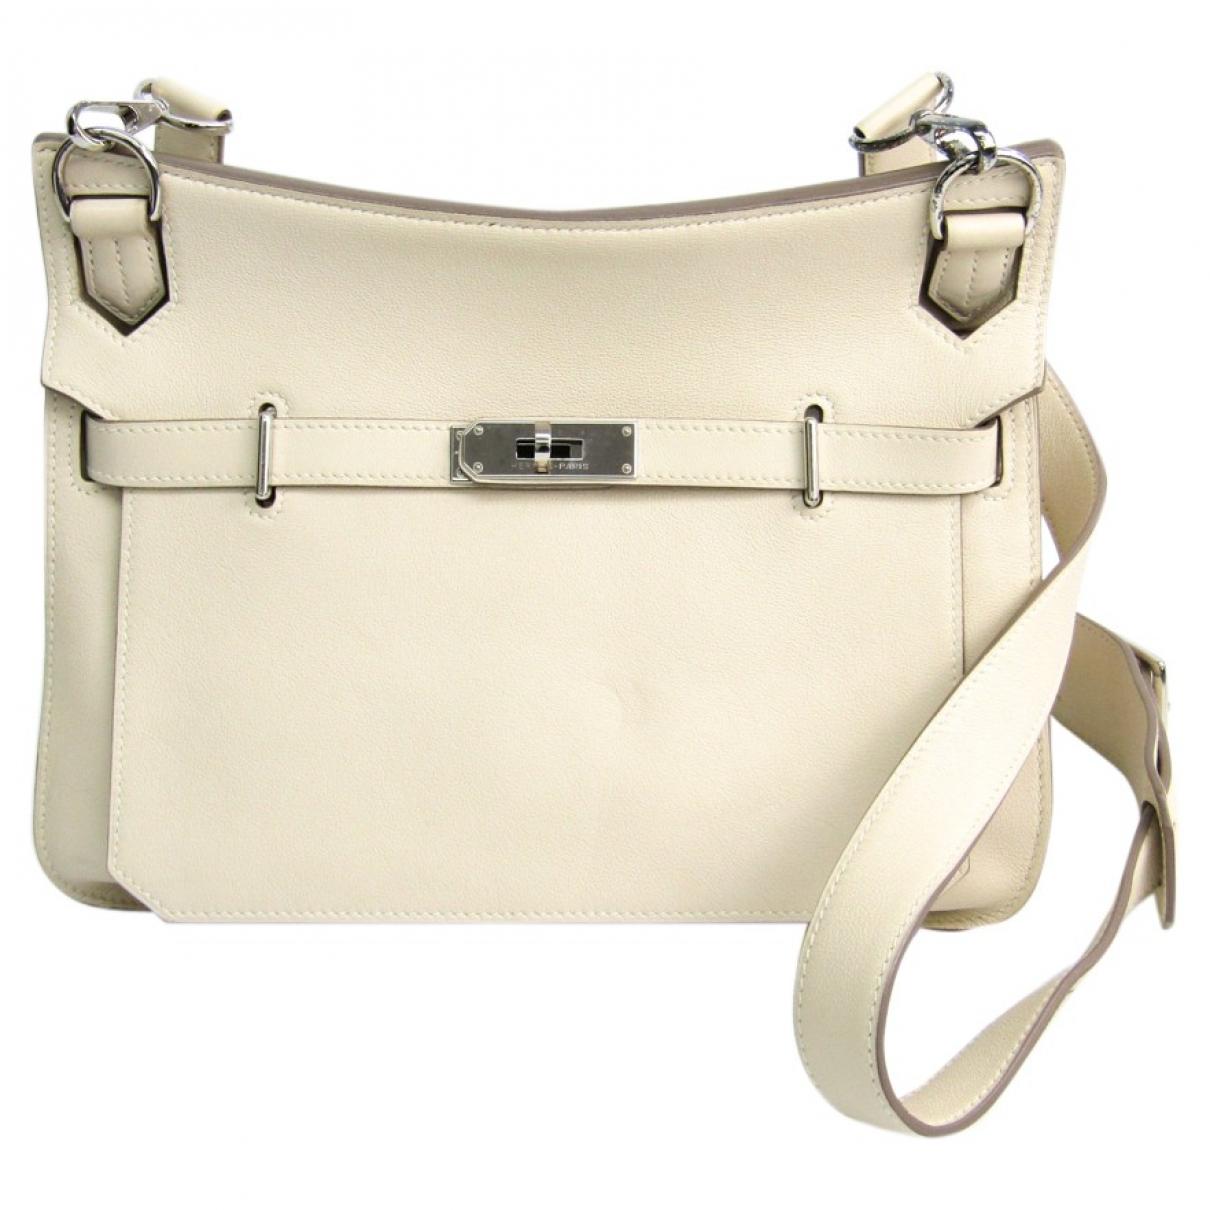 Hermès Jypsiere Beige Leather handbag for Women N